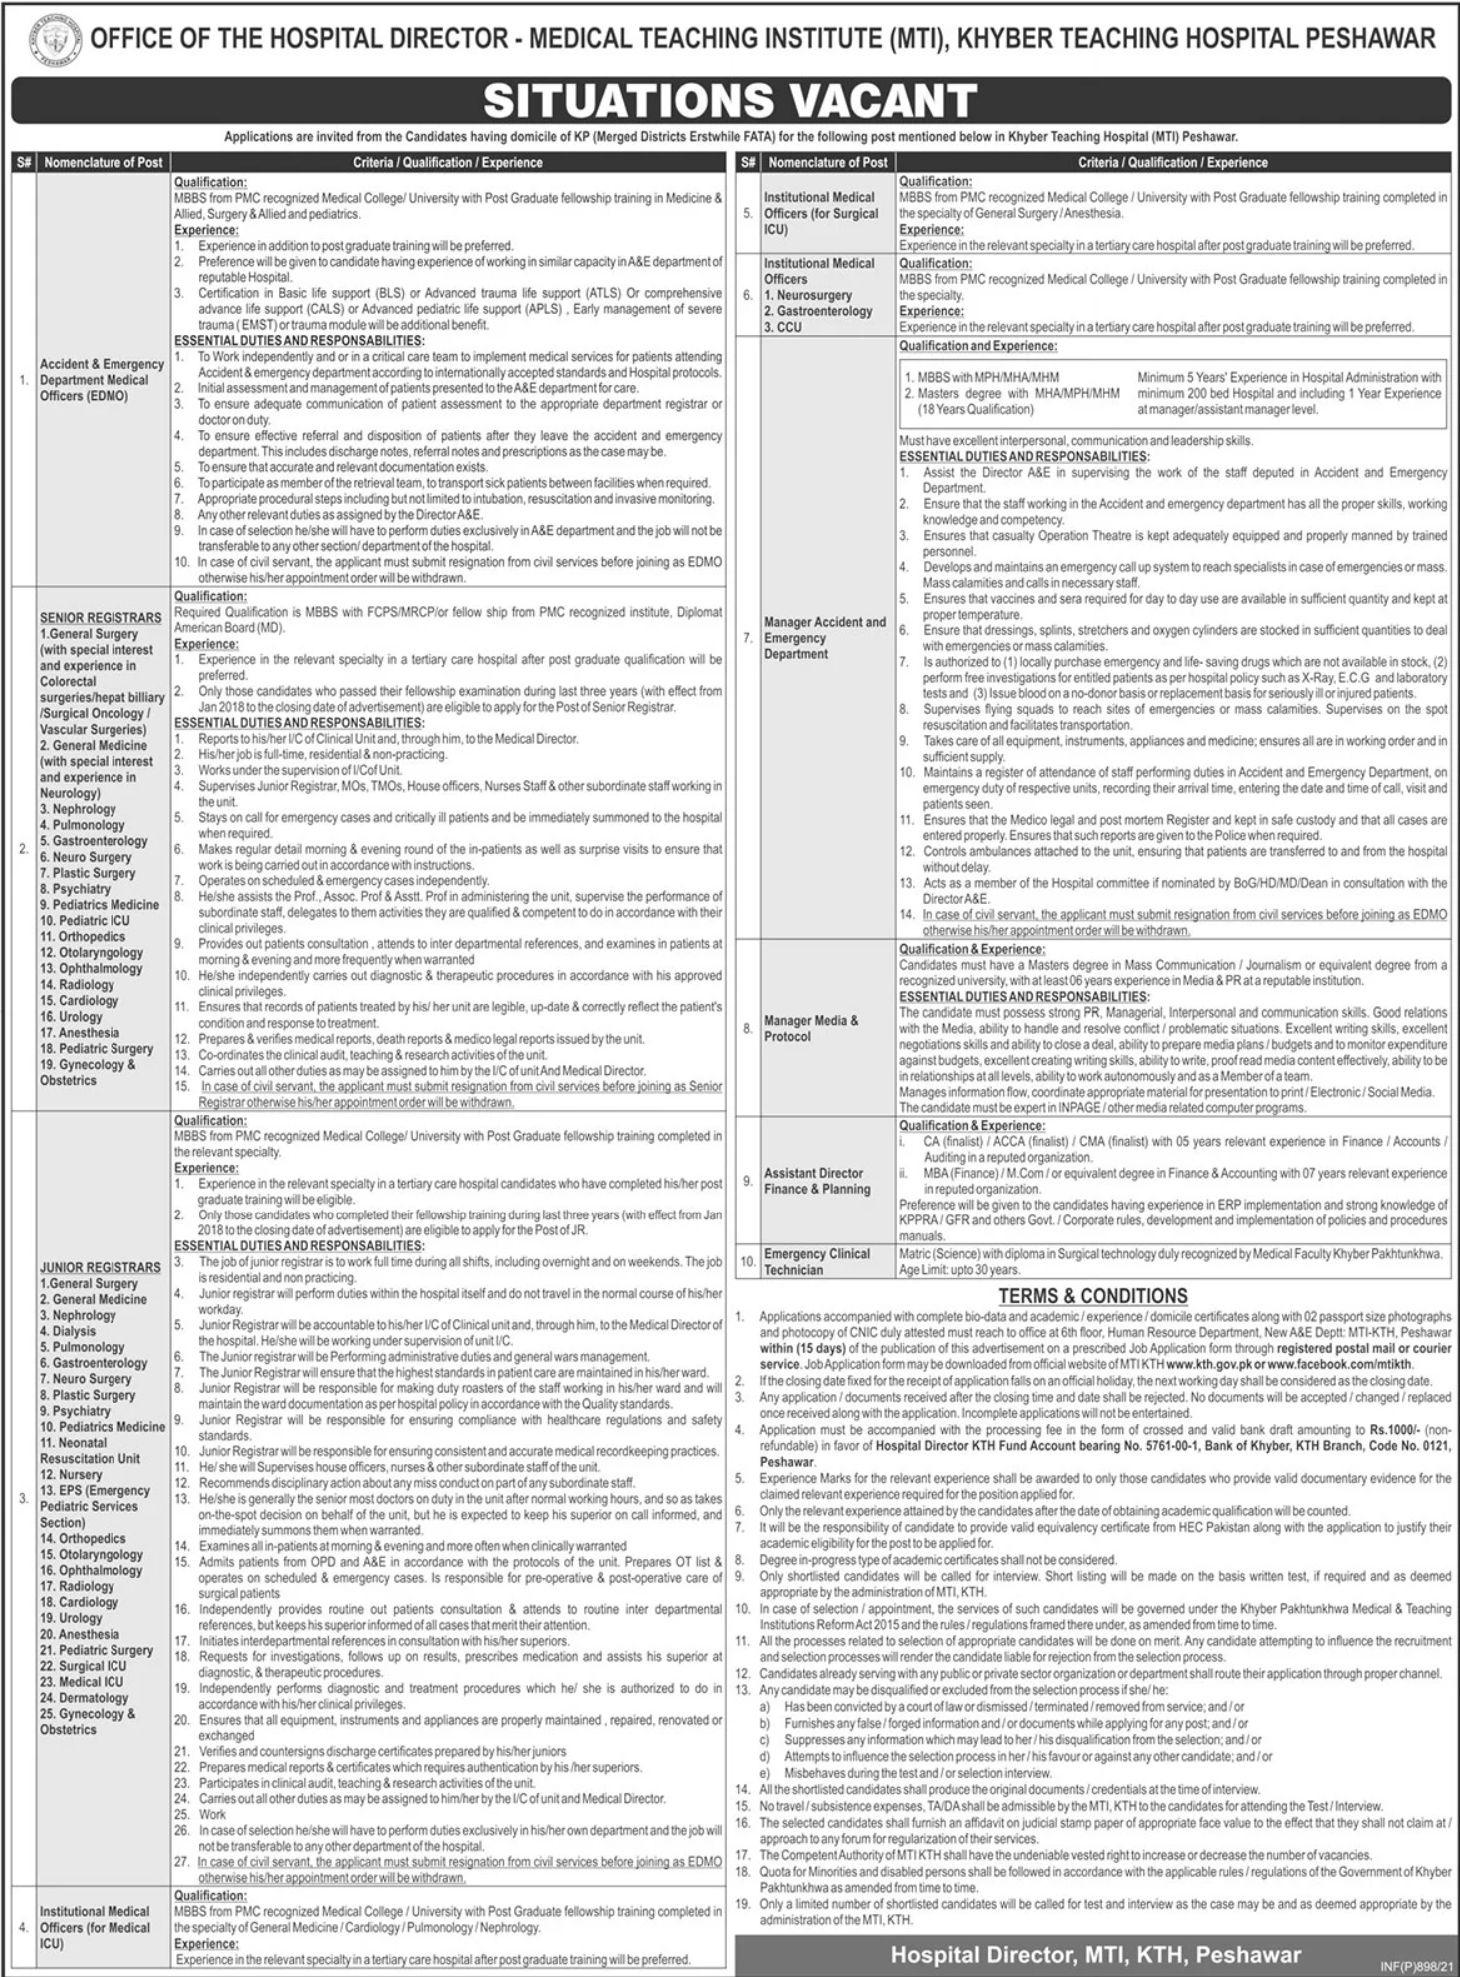 Today 21 February 2021 The News Newspaper Jobs, The News Jobs, Latest The News Jobs, Daily Newspaper Jobs,nokristan,newjobs2021,latest govt jobs